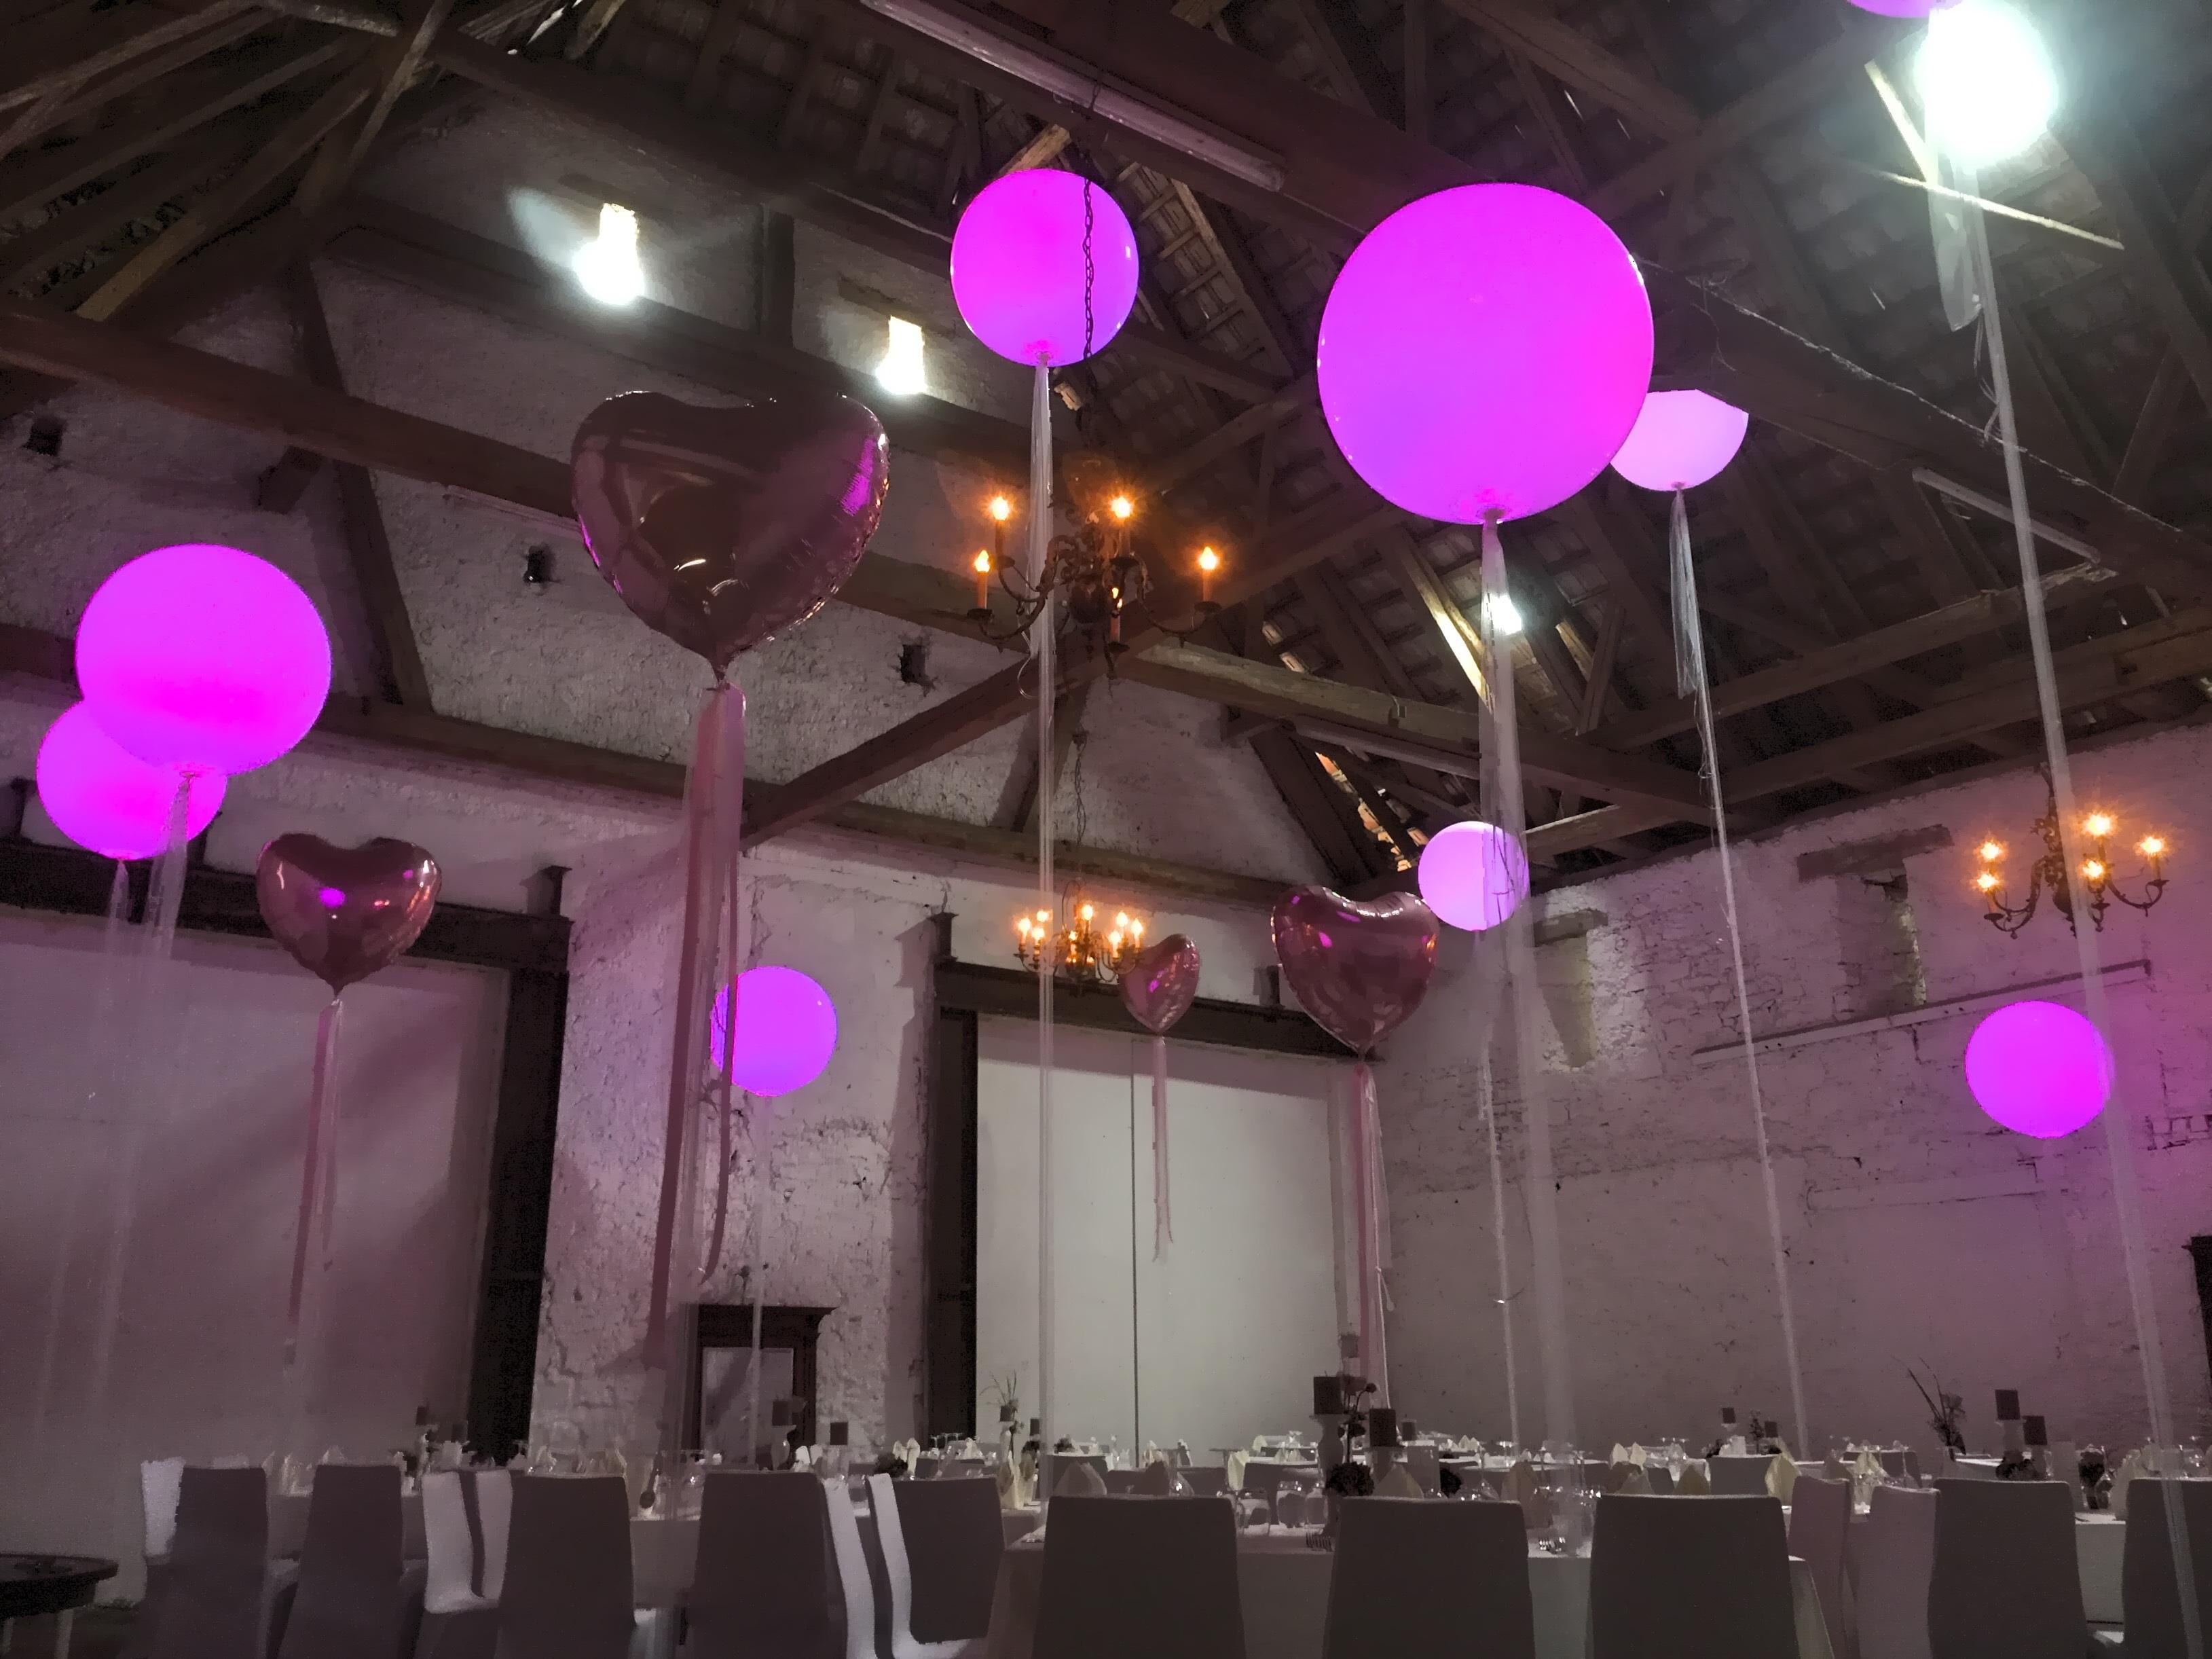 3385f294-5e33-29d9-aebe-871d988d3647 Luxus Ballon Mit Led Licht Dekorationen